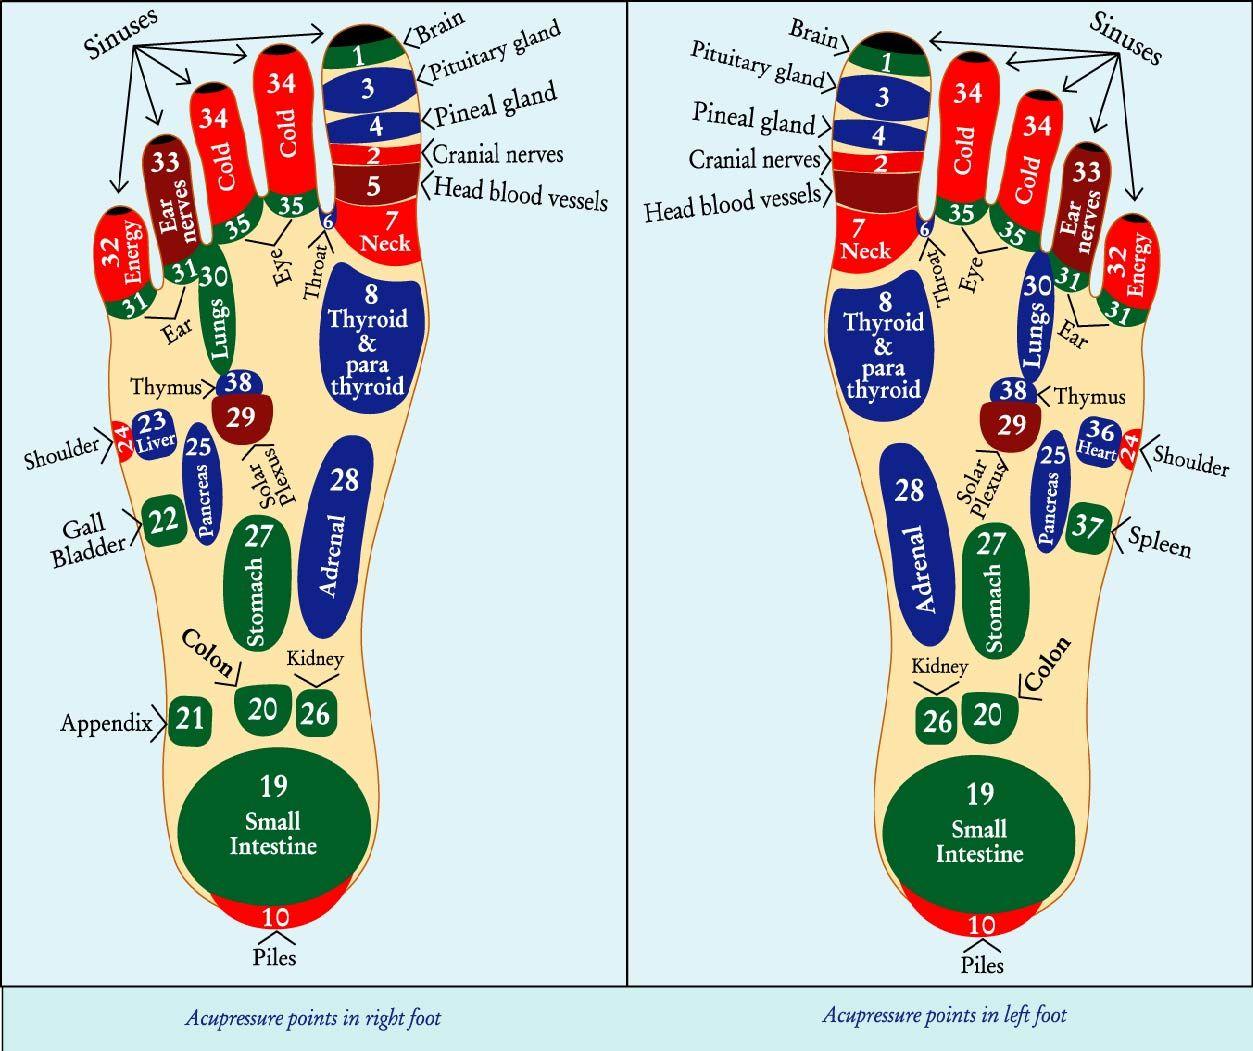 Pin by Edu2U on Health | Acupressure, Acupressure points ...